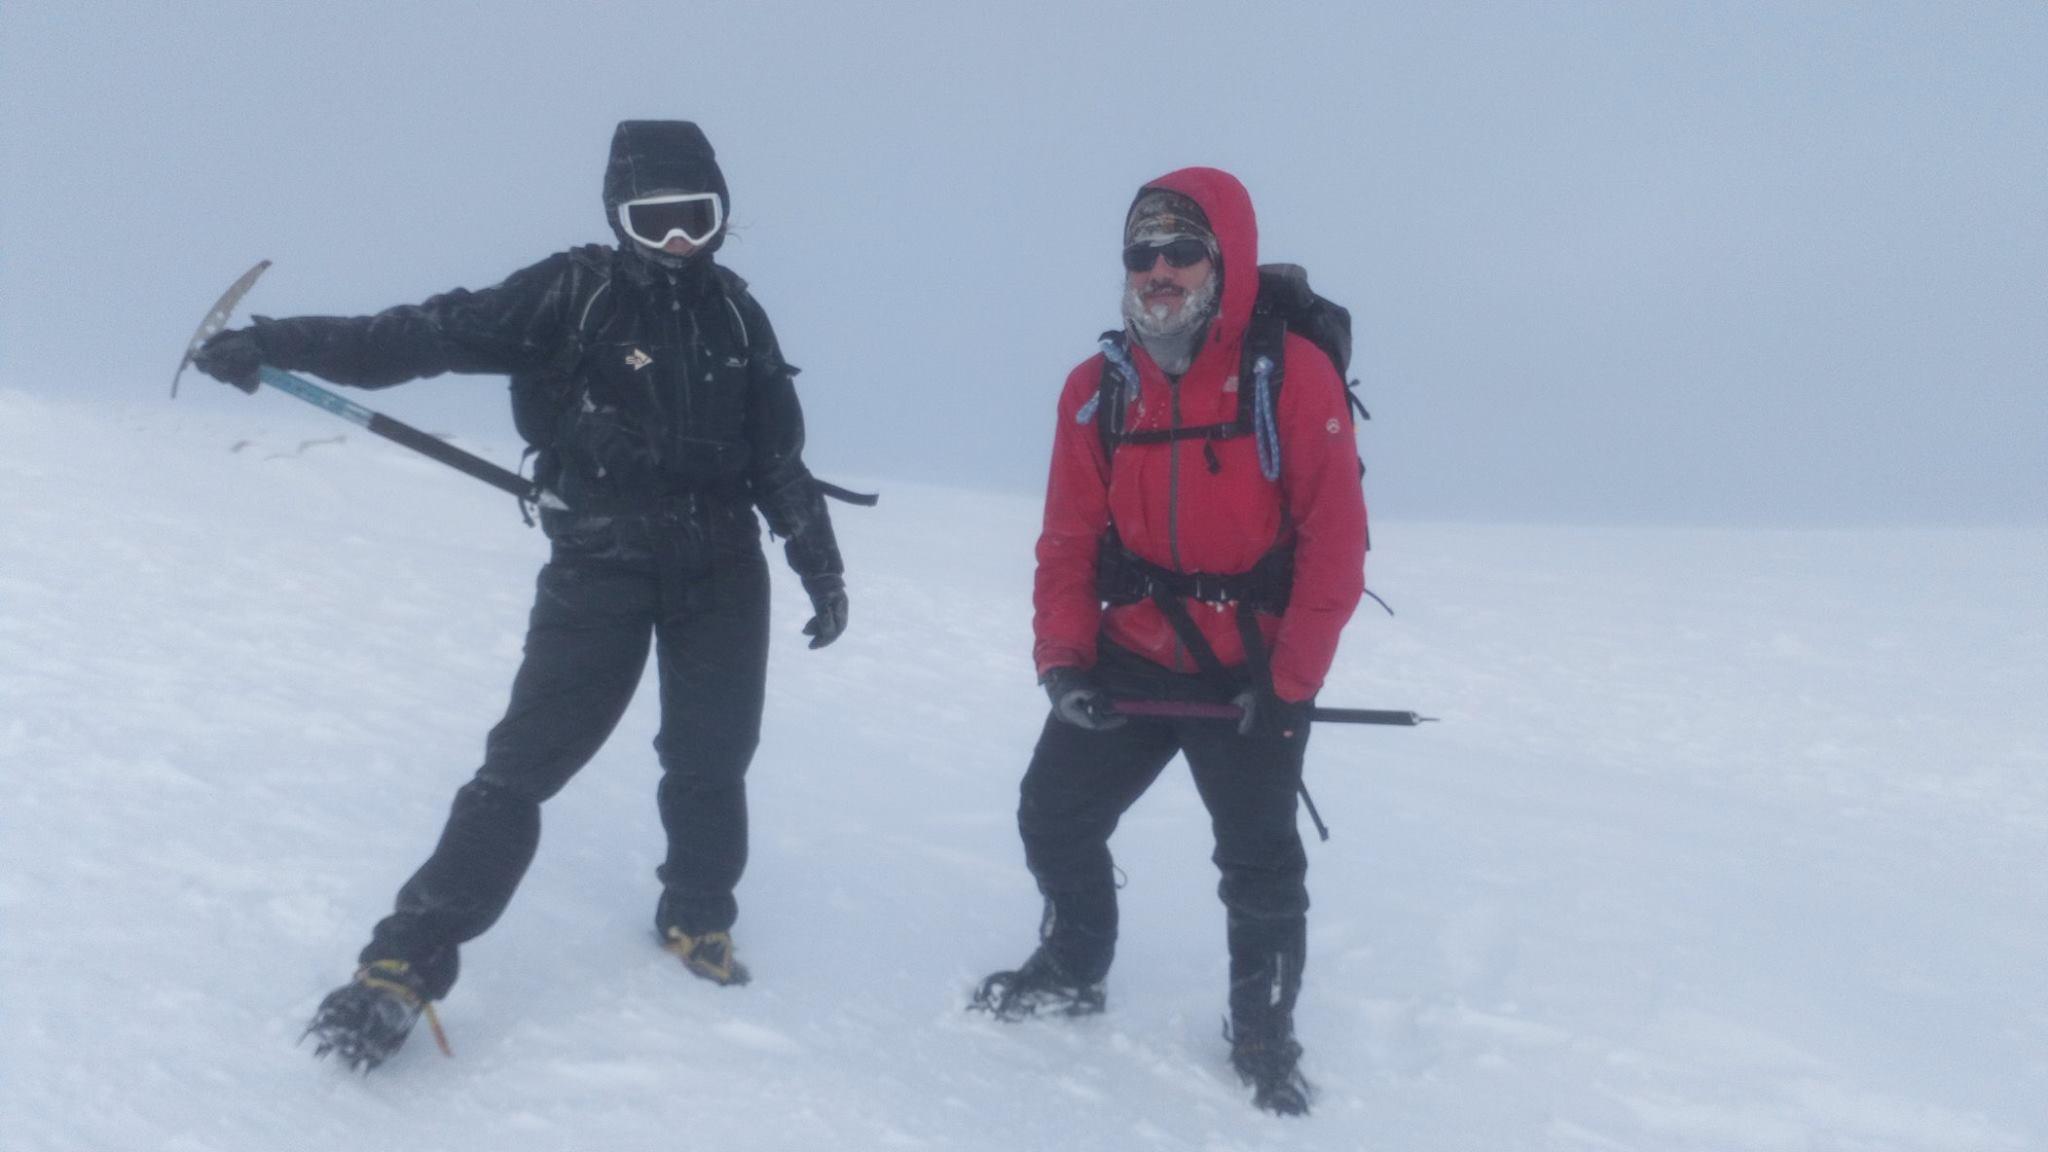 Hiking in Scotland in winter